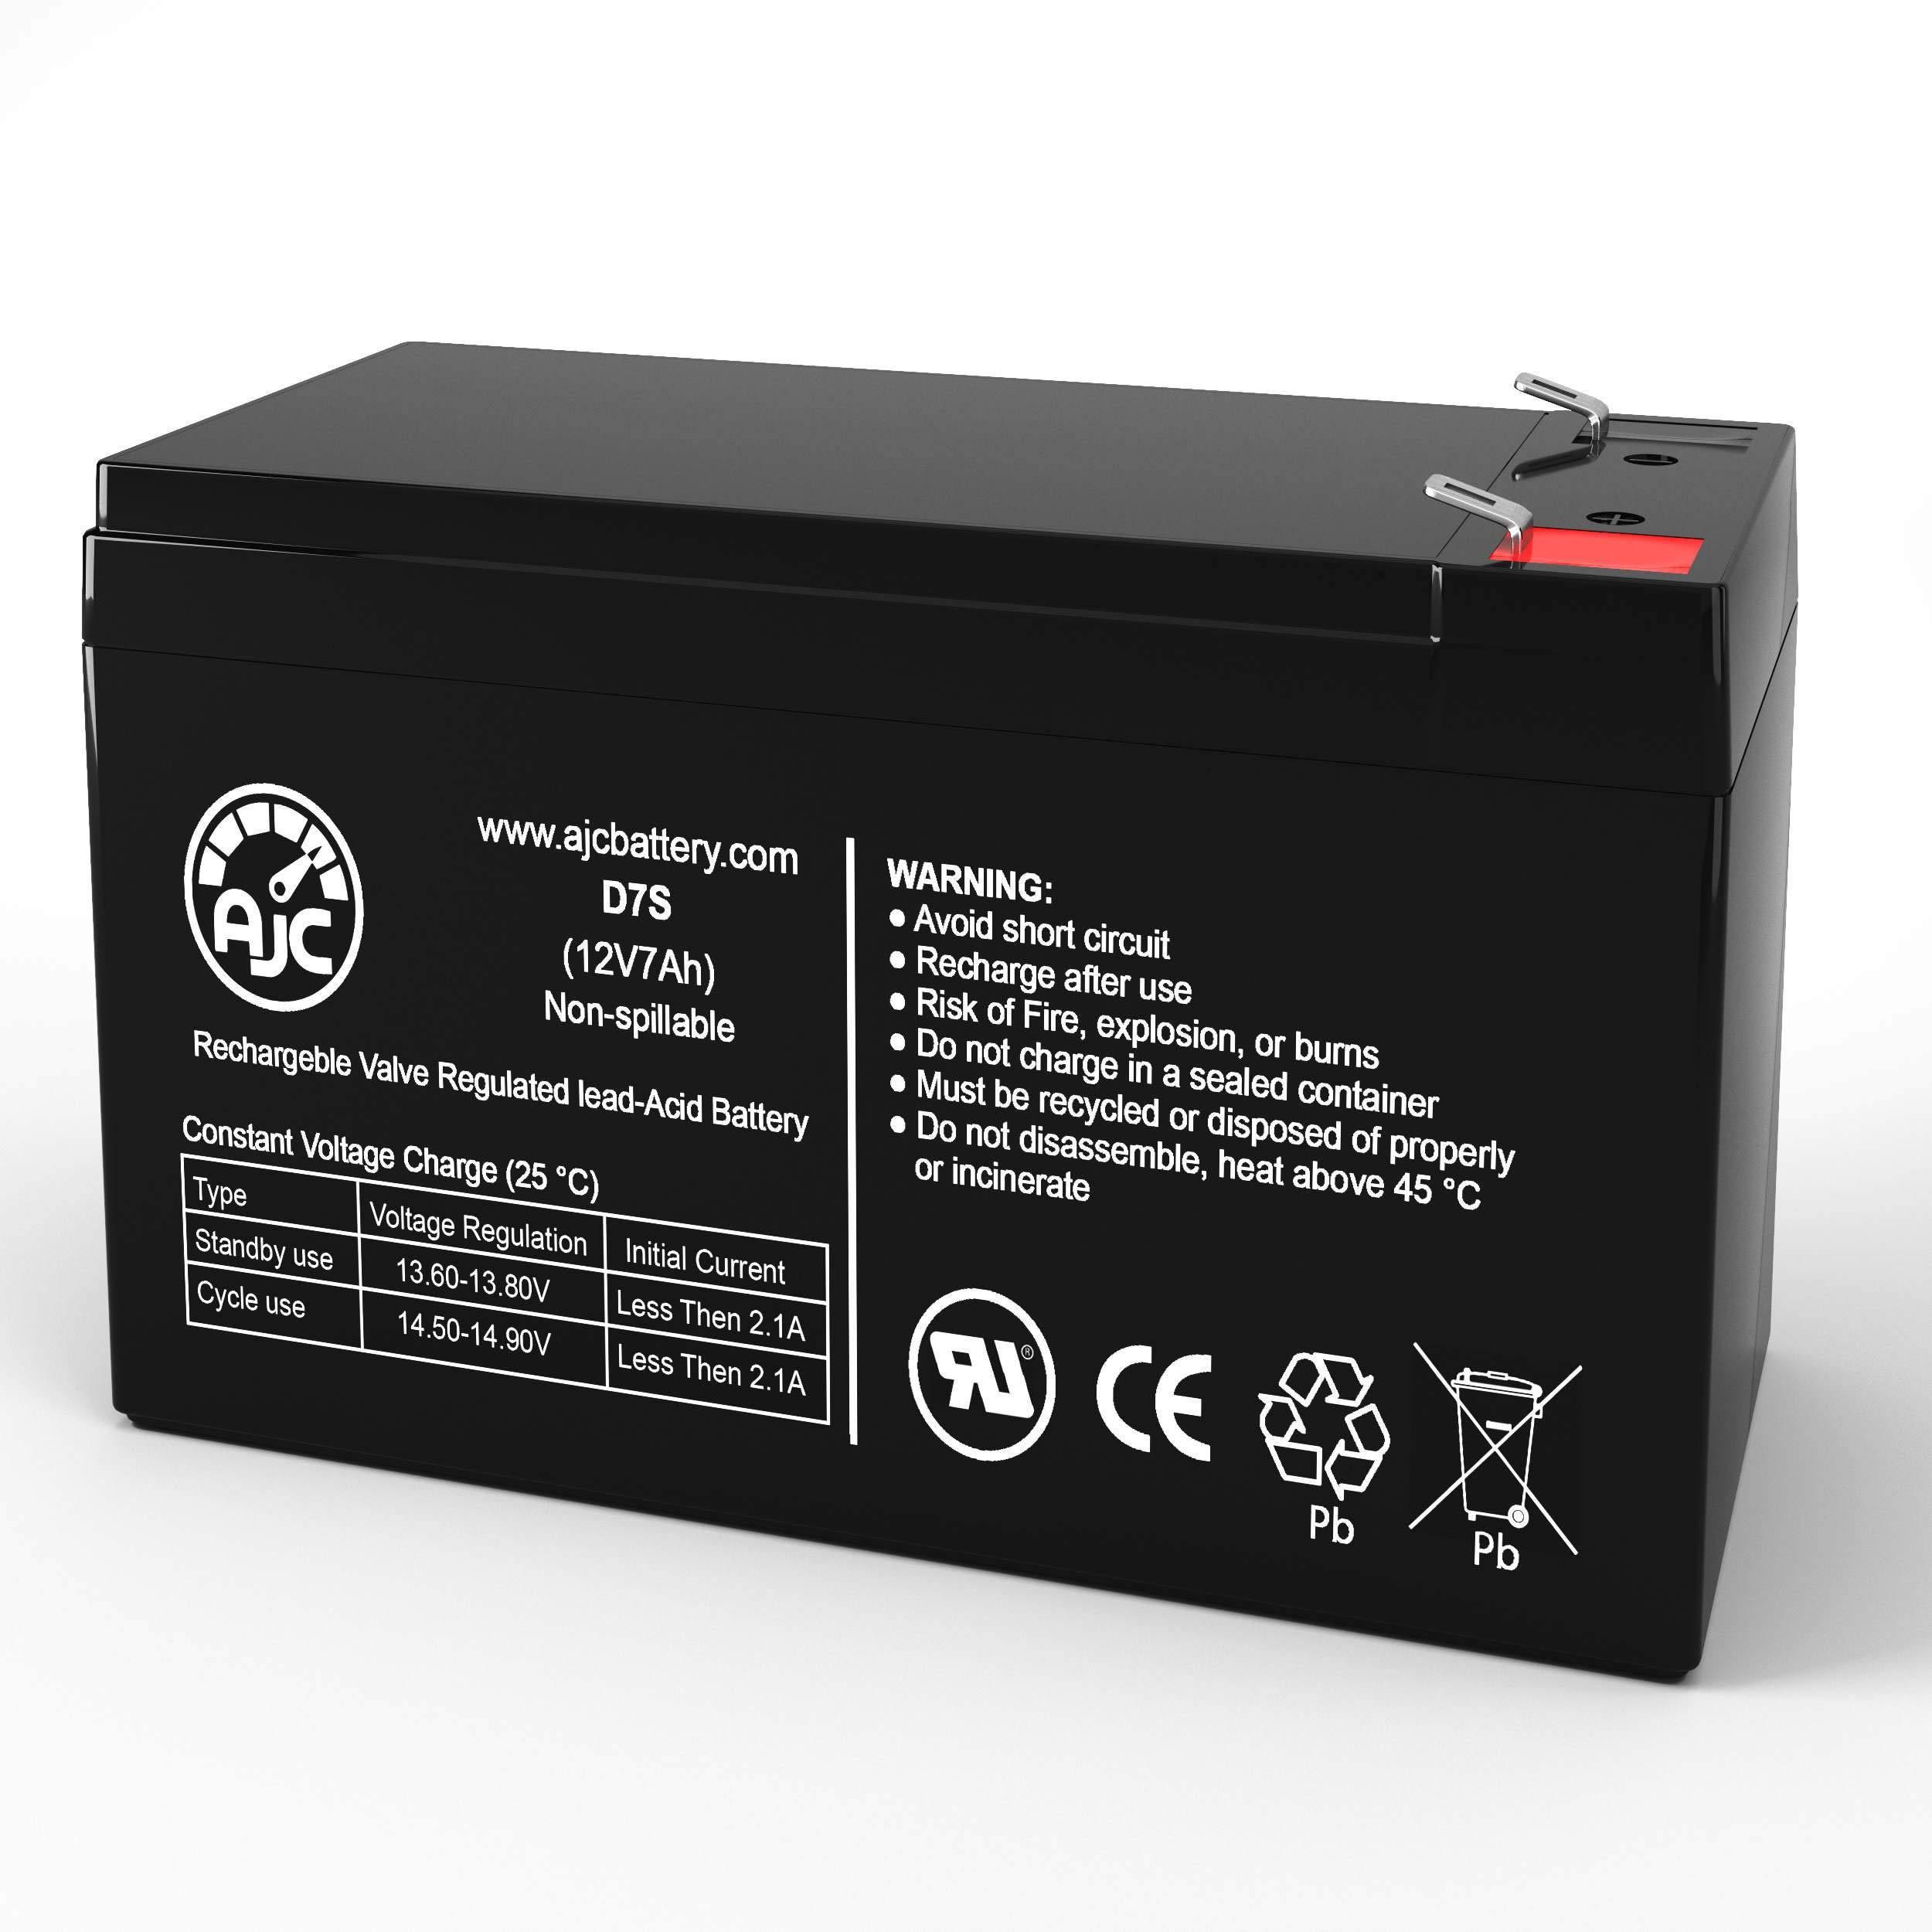 Powercom Vanguard VGD-6000 VGD-6000 RM 12V 7Ah UPS Battery This is an AJC Brand Replacement